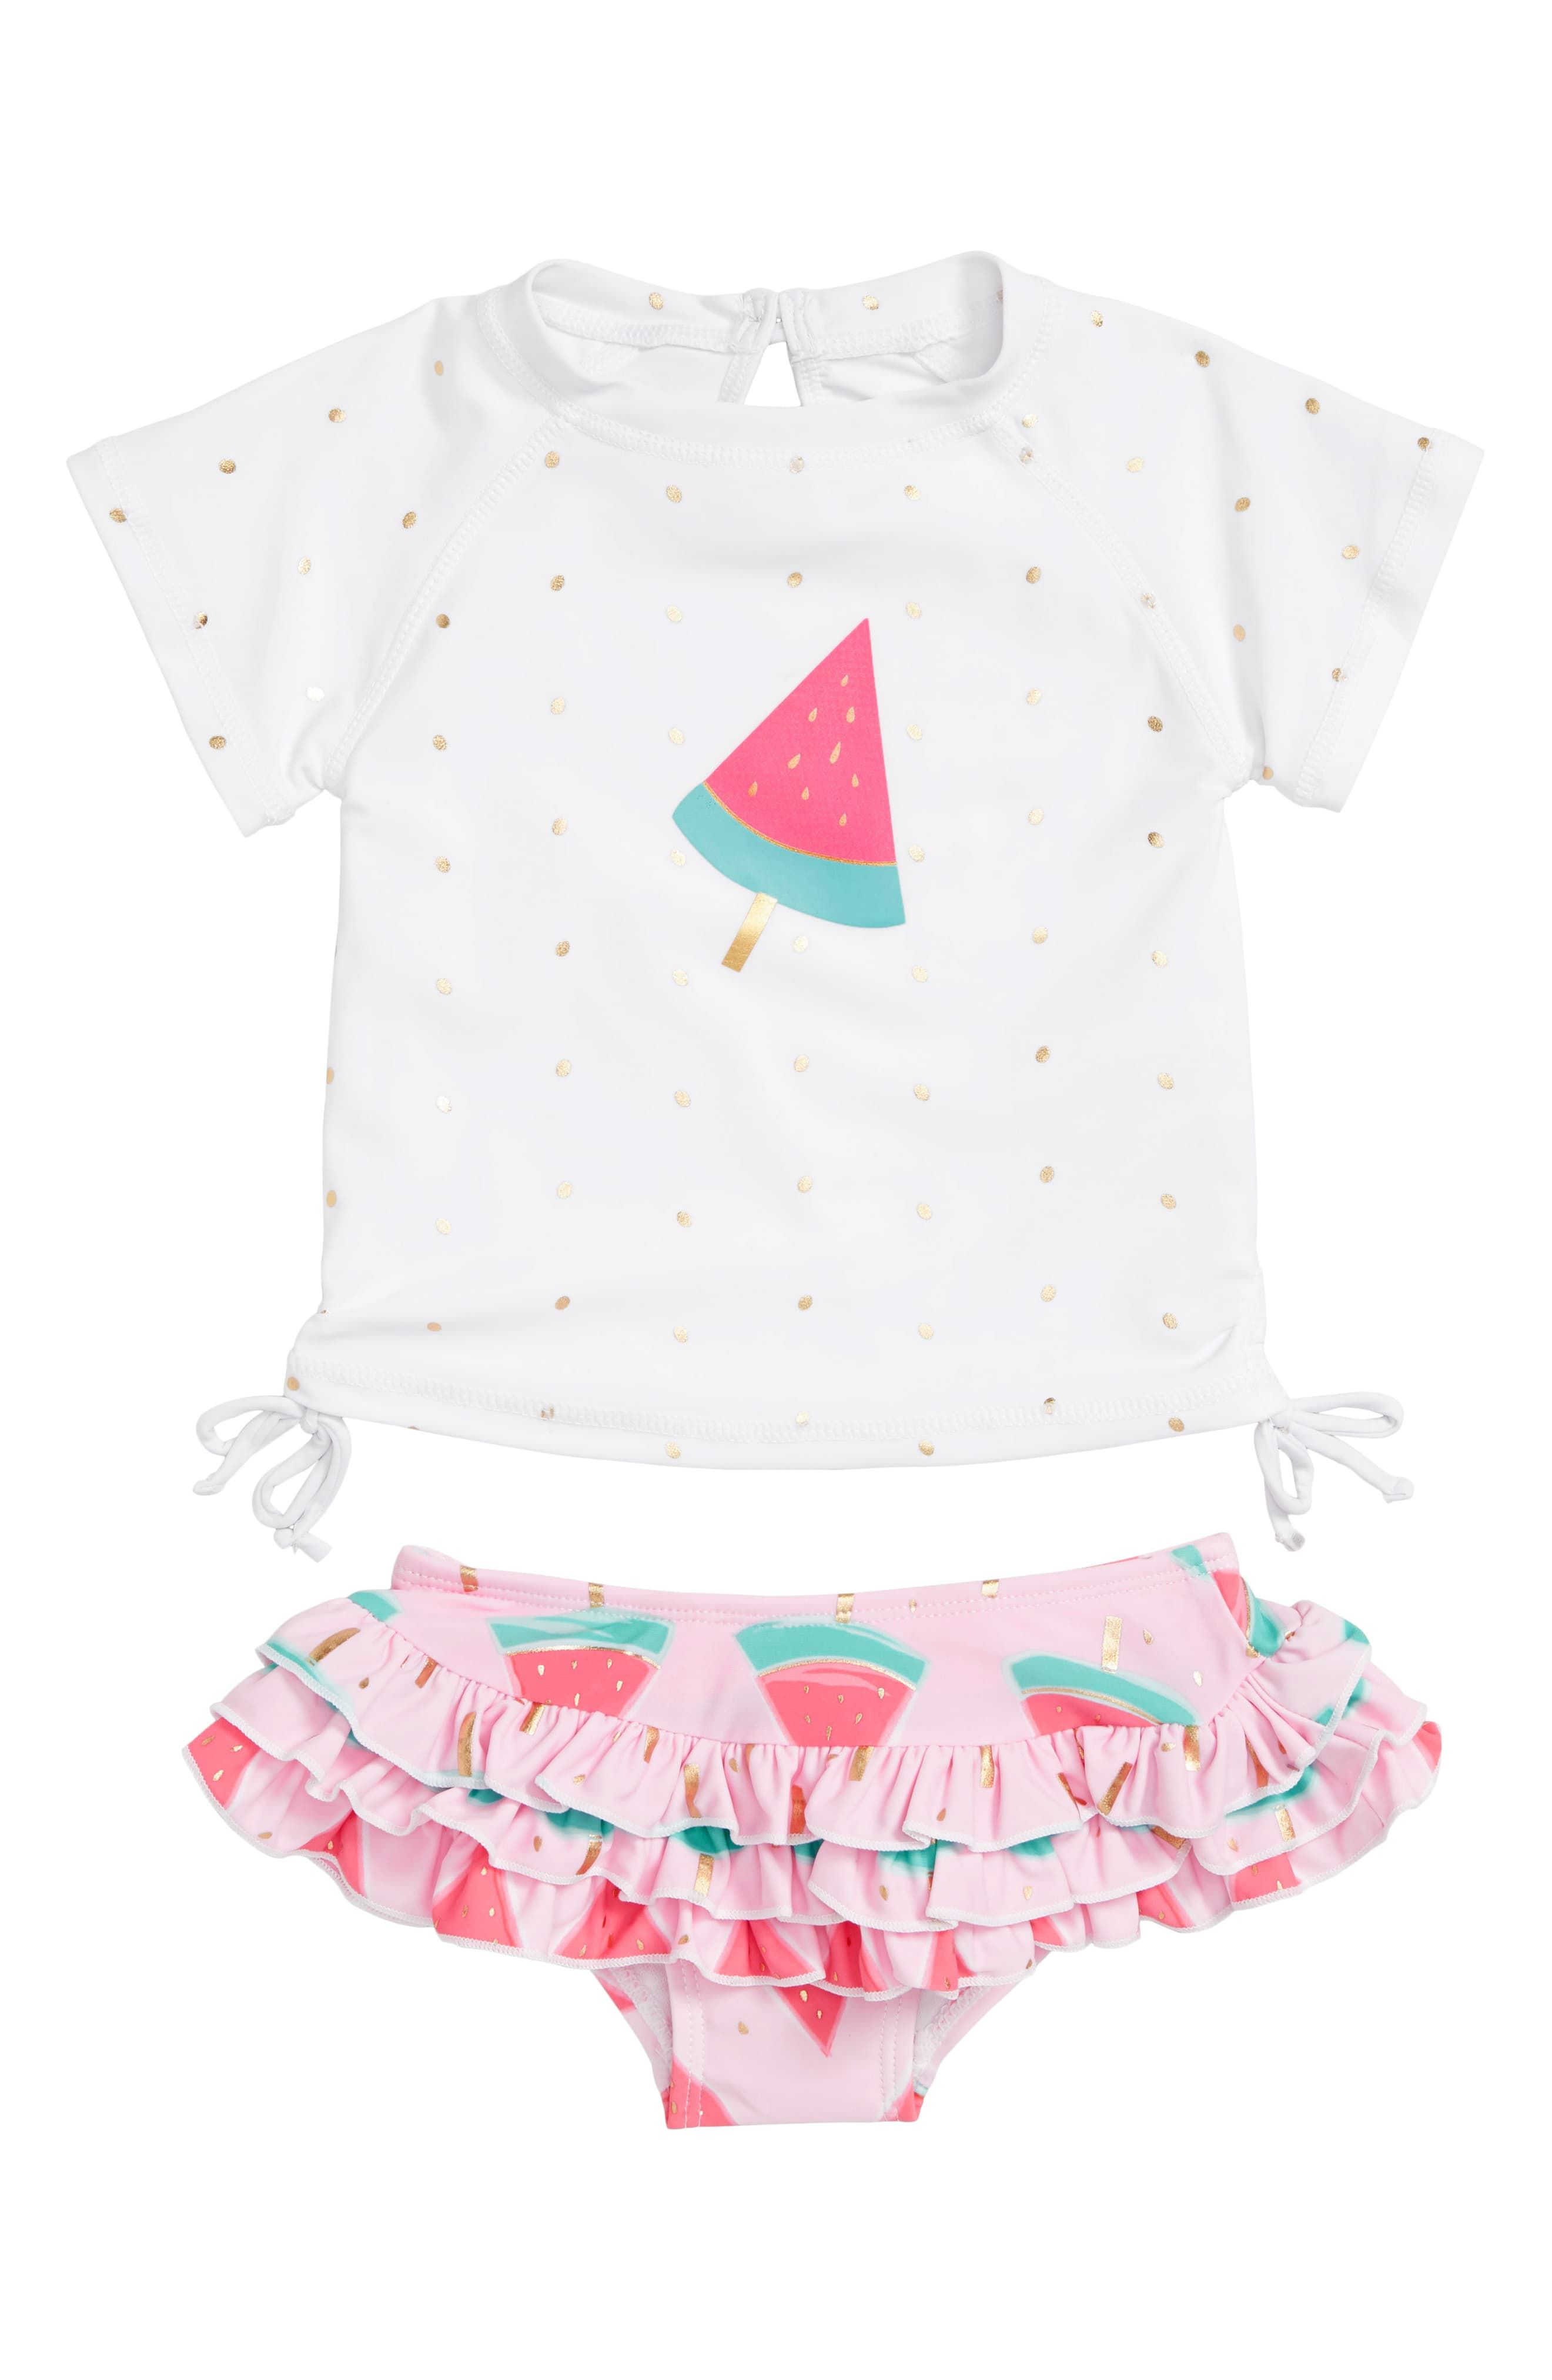 beae21e1b2a9e Infant Girl's Snapper Rock Watermelon Two-Piece Rashguard Swimsuit, Size  3-6M - Pink